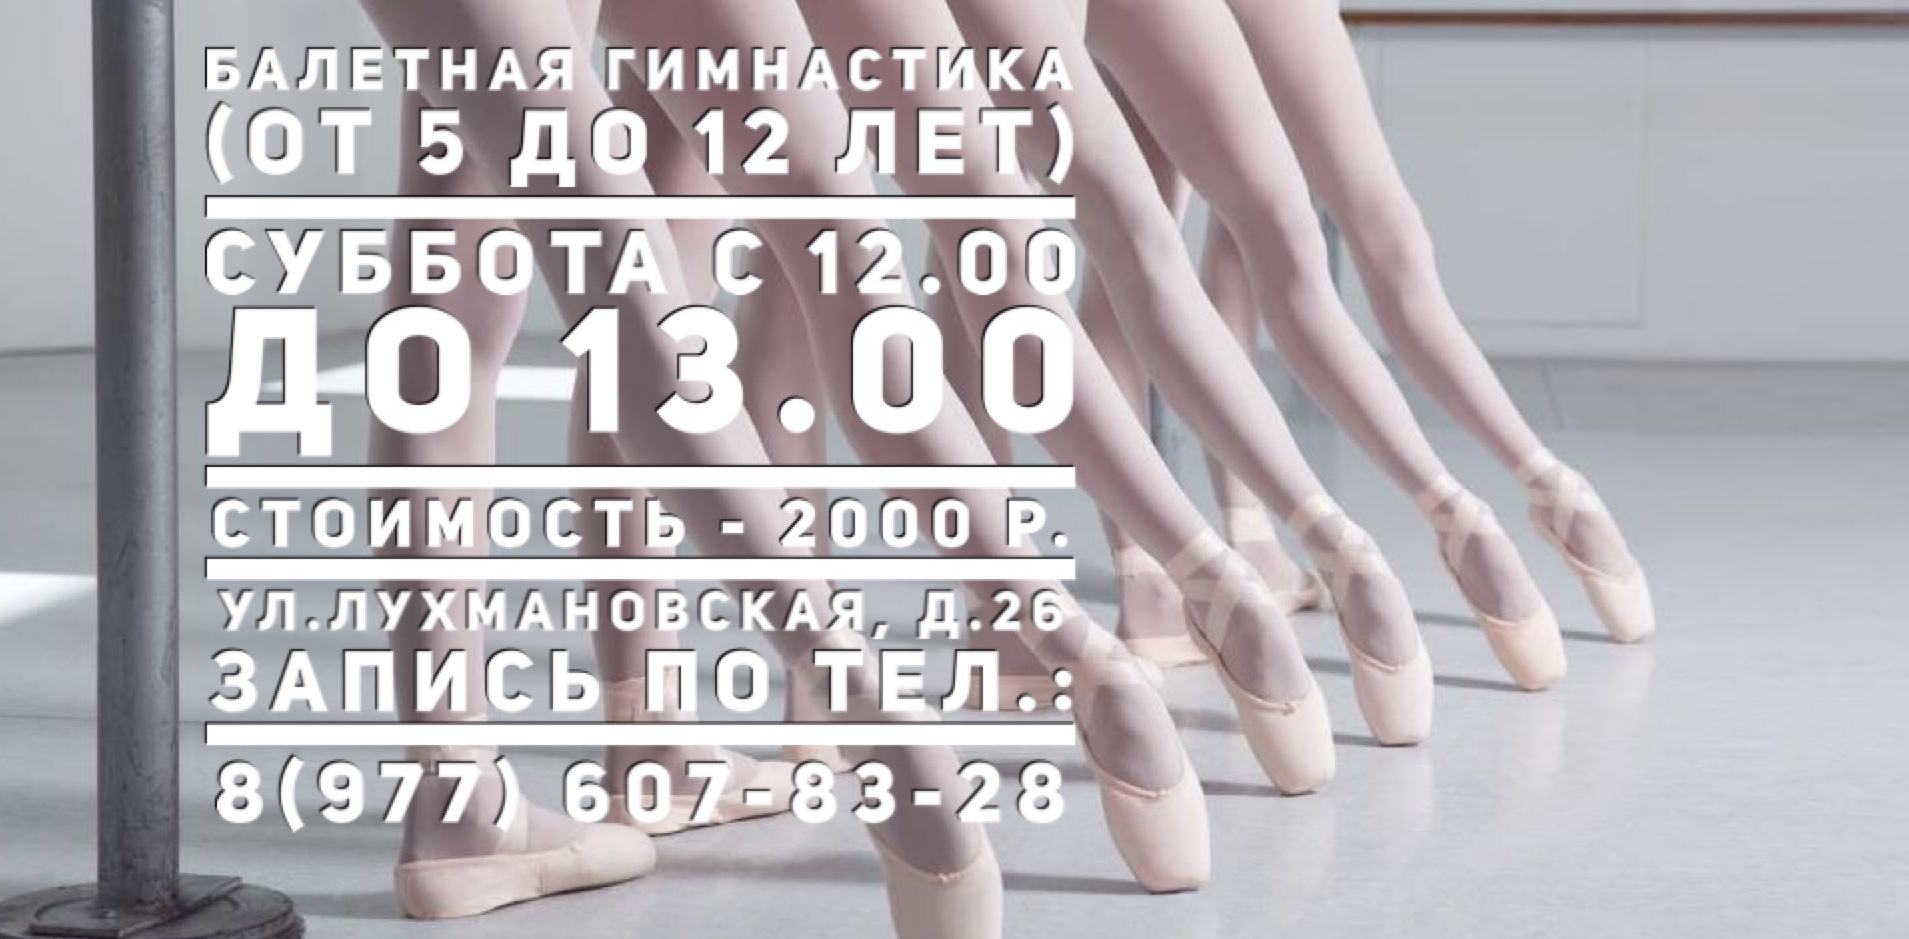 175BD874-5050-4635-8C21-9CFEEE9F57FC